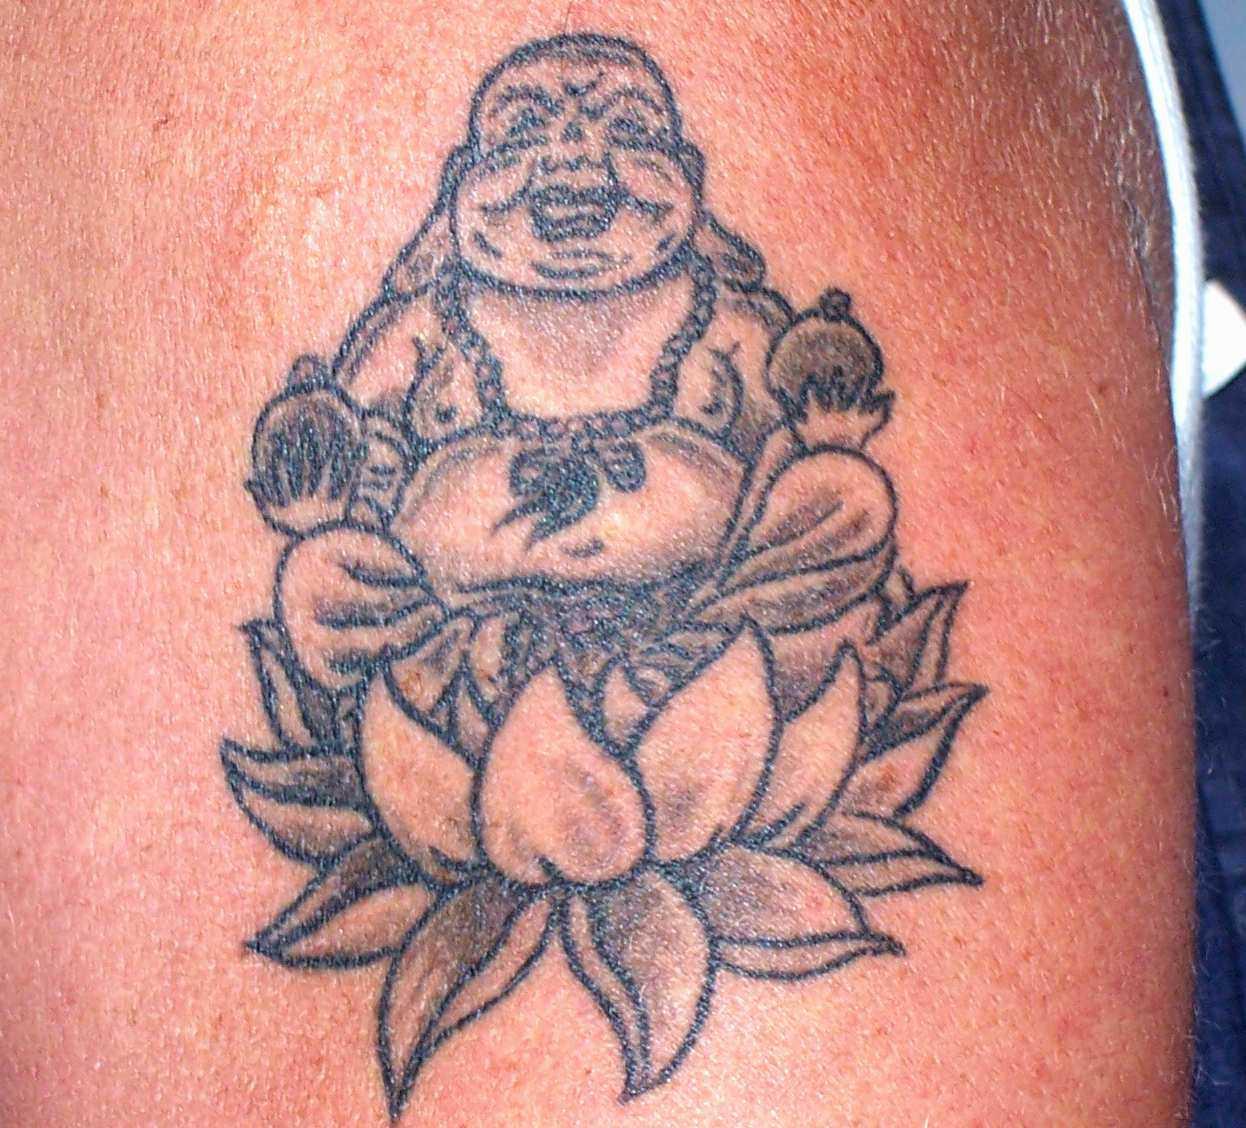 Fabulous Afbeeldingen Boeddha Tattoo - ARCHIDEV @AA62